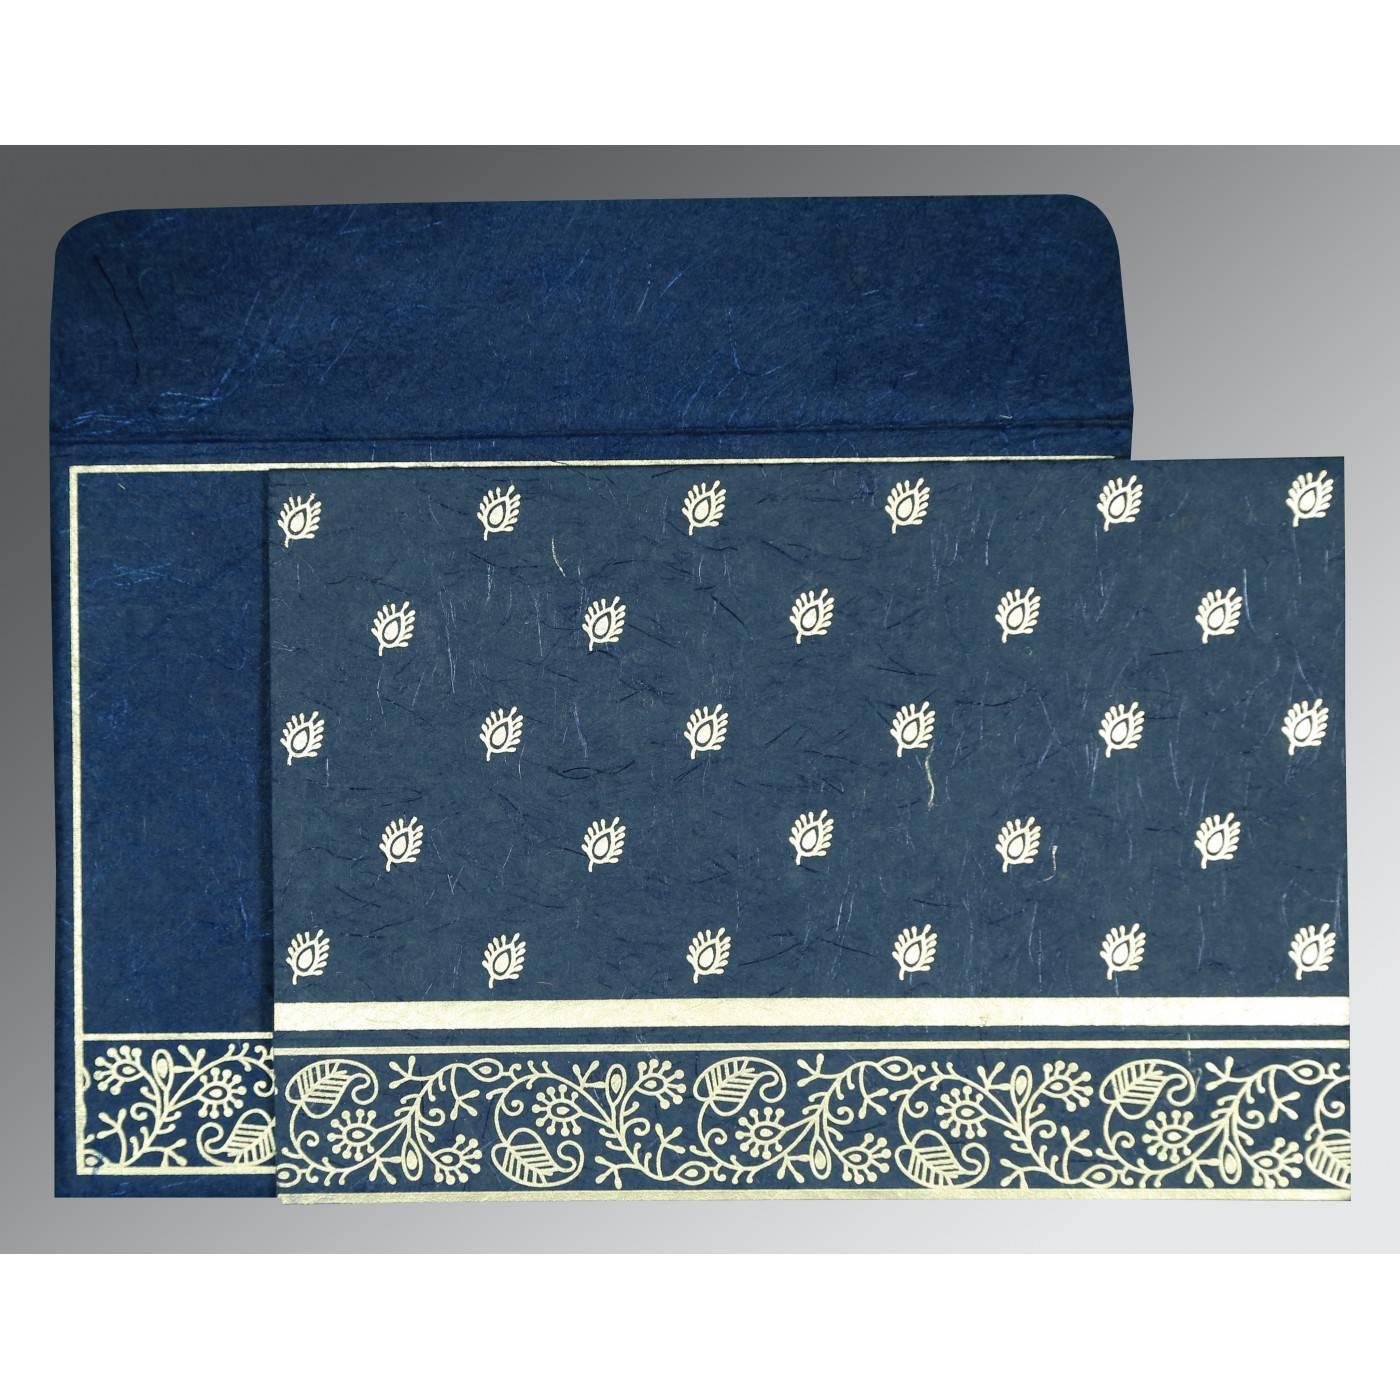 COBALT BLUE HANDMADE SILK SCREEN PRINTED WEDDING CARD : CIN-8215I - IndianWeddingCards